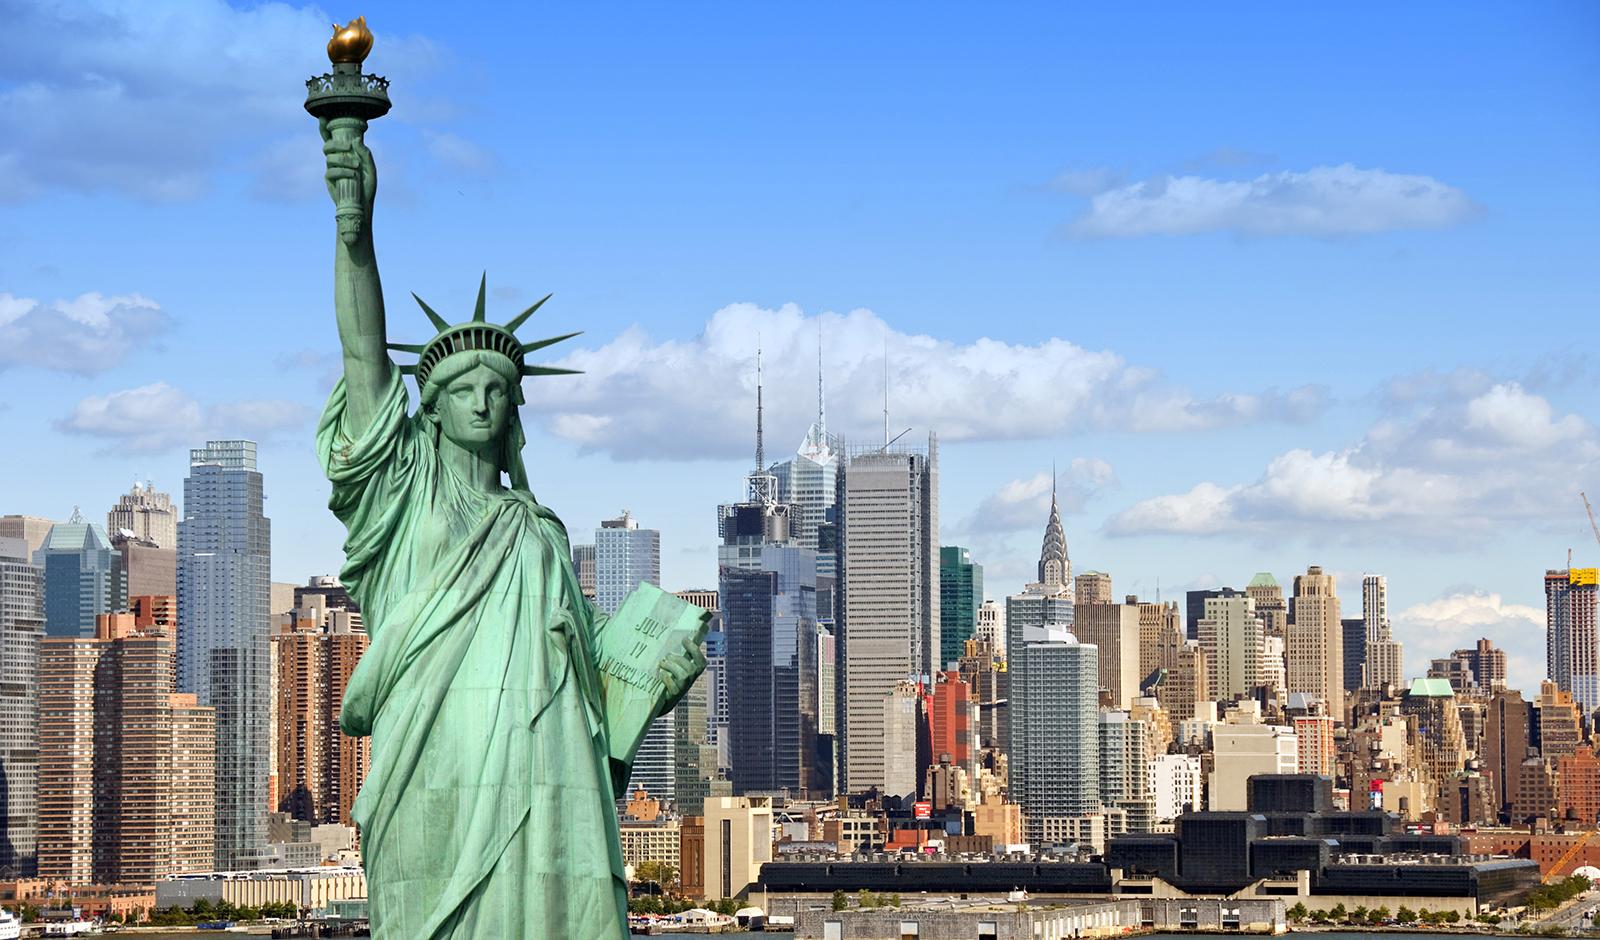 tour-new-york-city-travel-us-state-of-liberty-manhattan